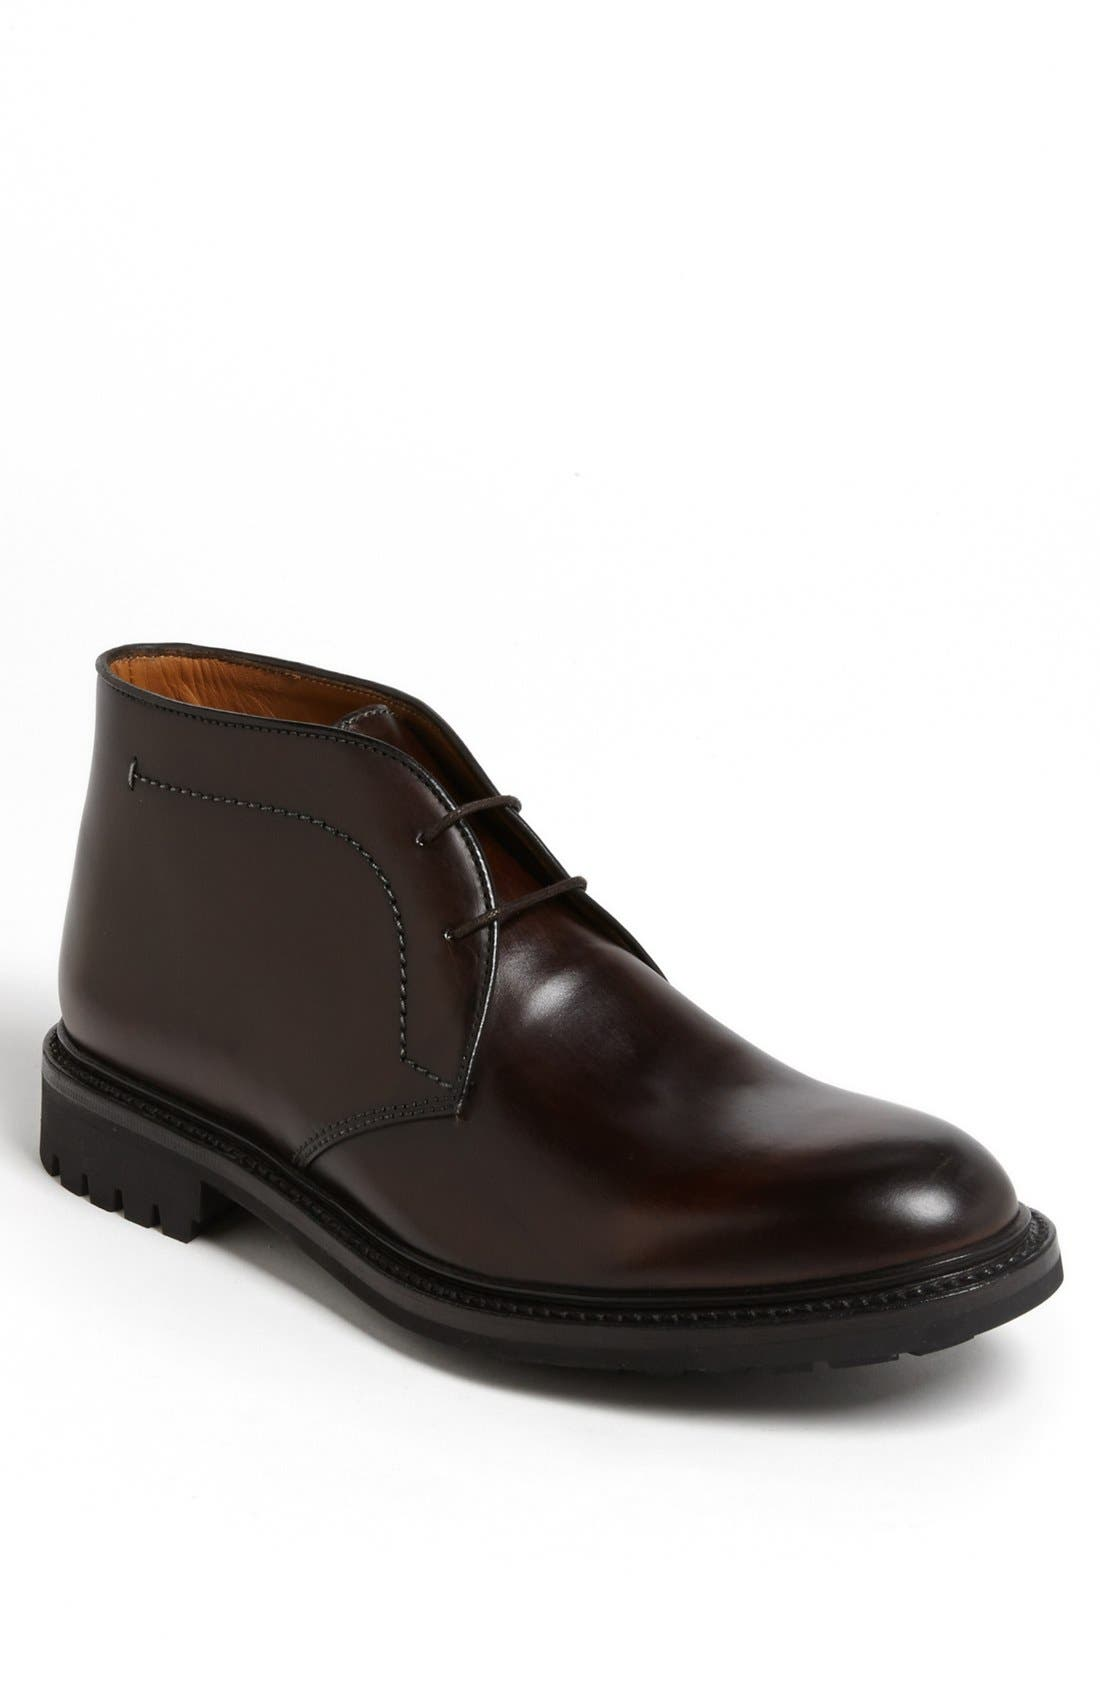 Alternate Image 1 Selected - Lottusse Leather Chukka Boot